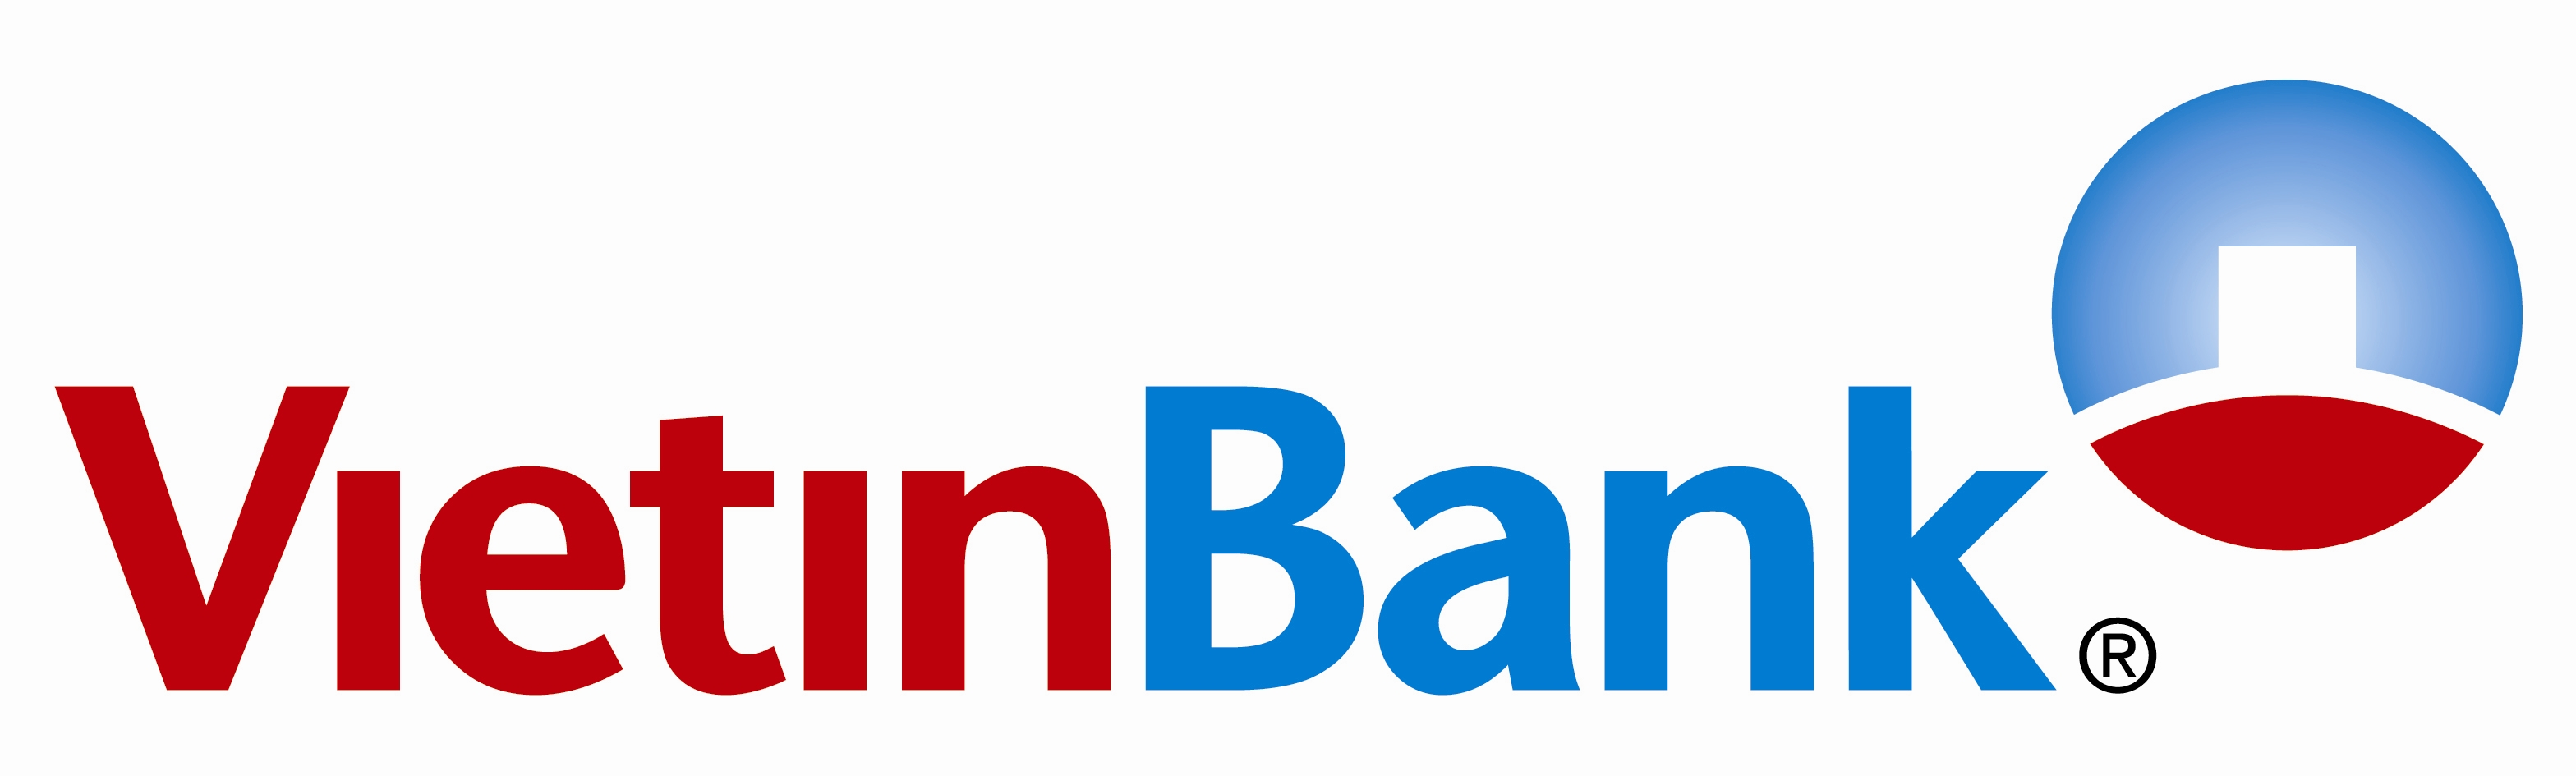 CTG - Vietnam Joint Stock Commercial Bank for Industry and Trade -  VIETINBANK - VietstockFinance - Vietinbank PNG